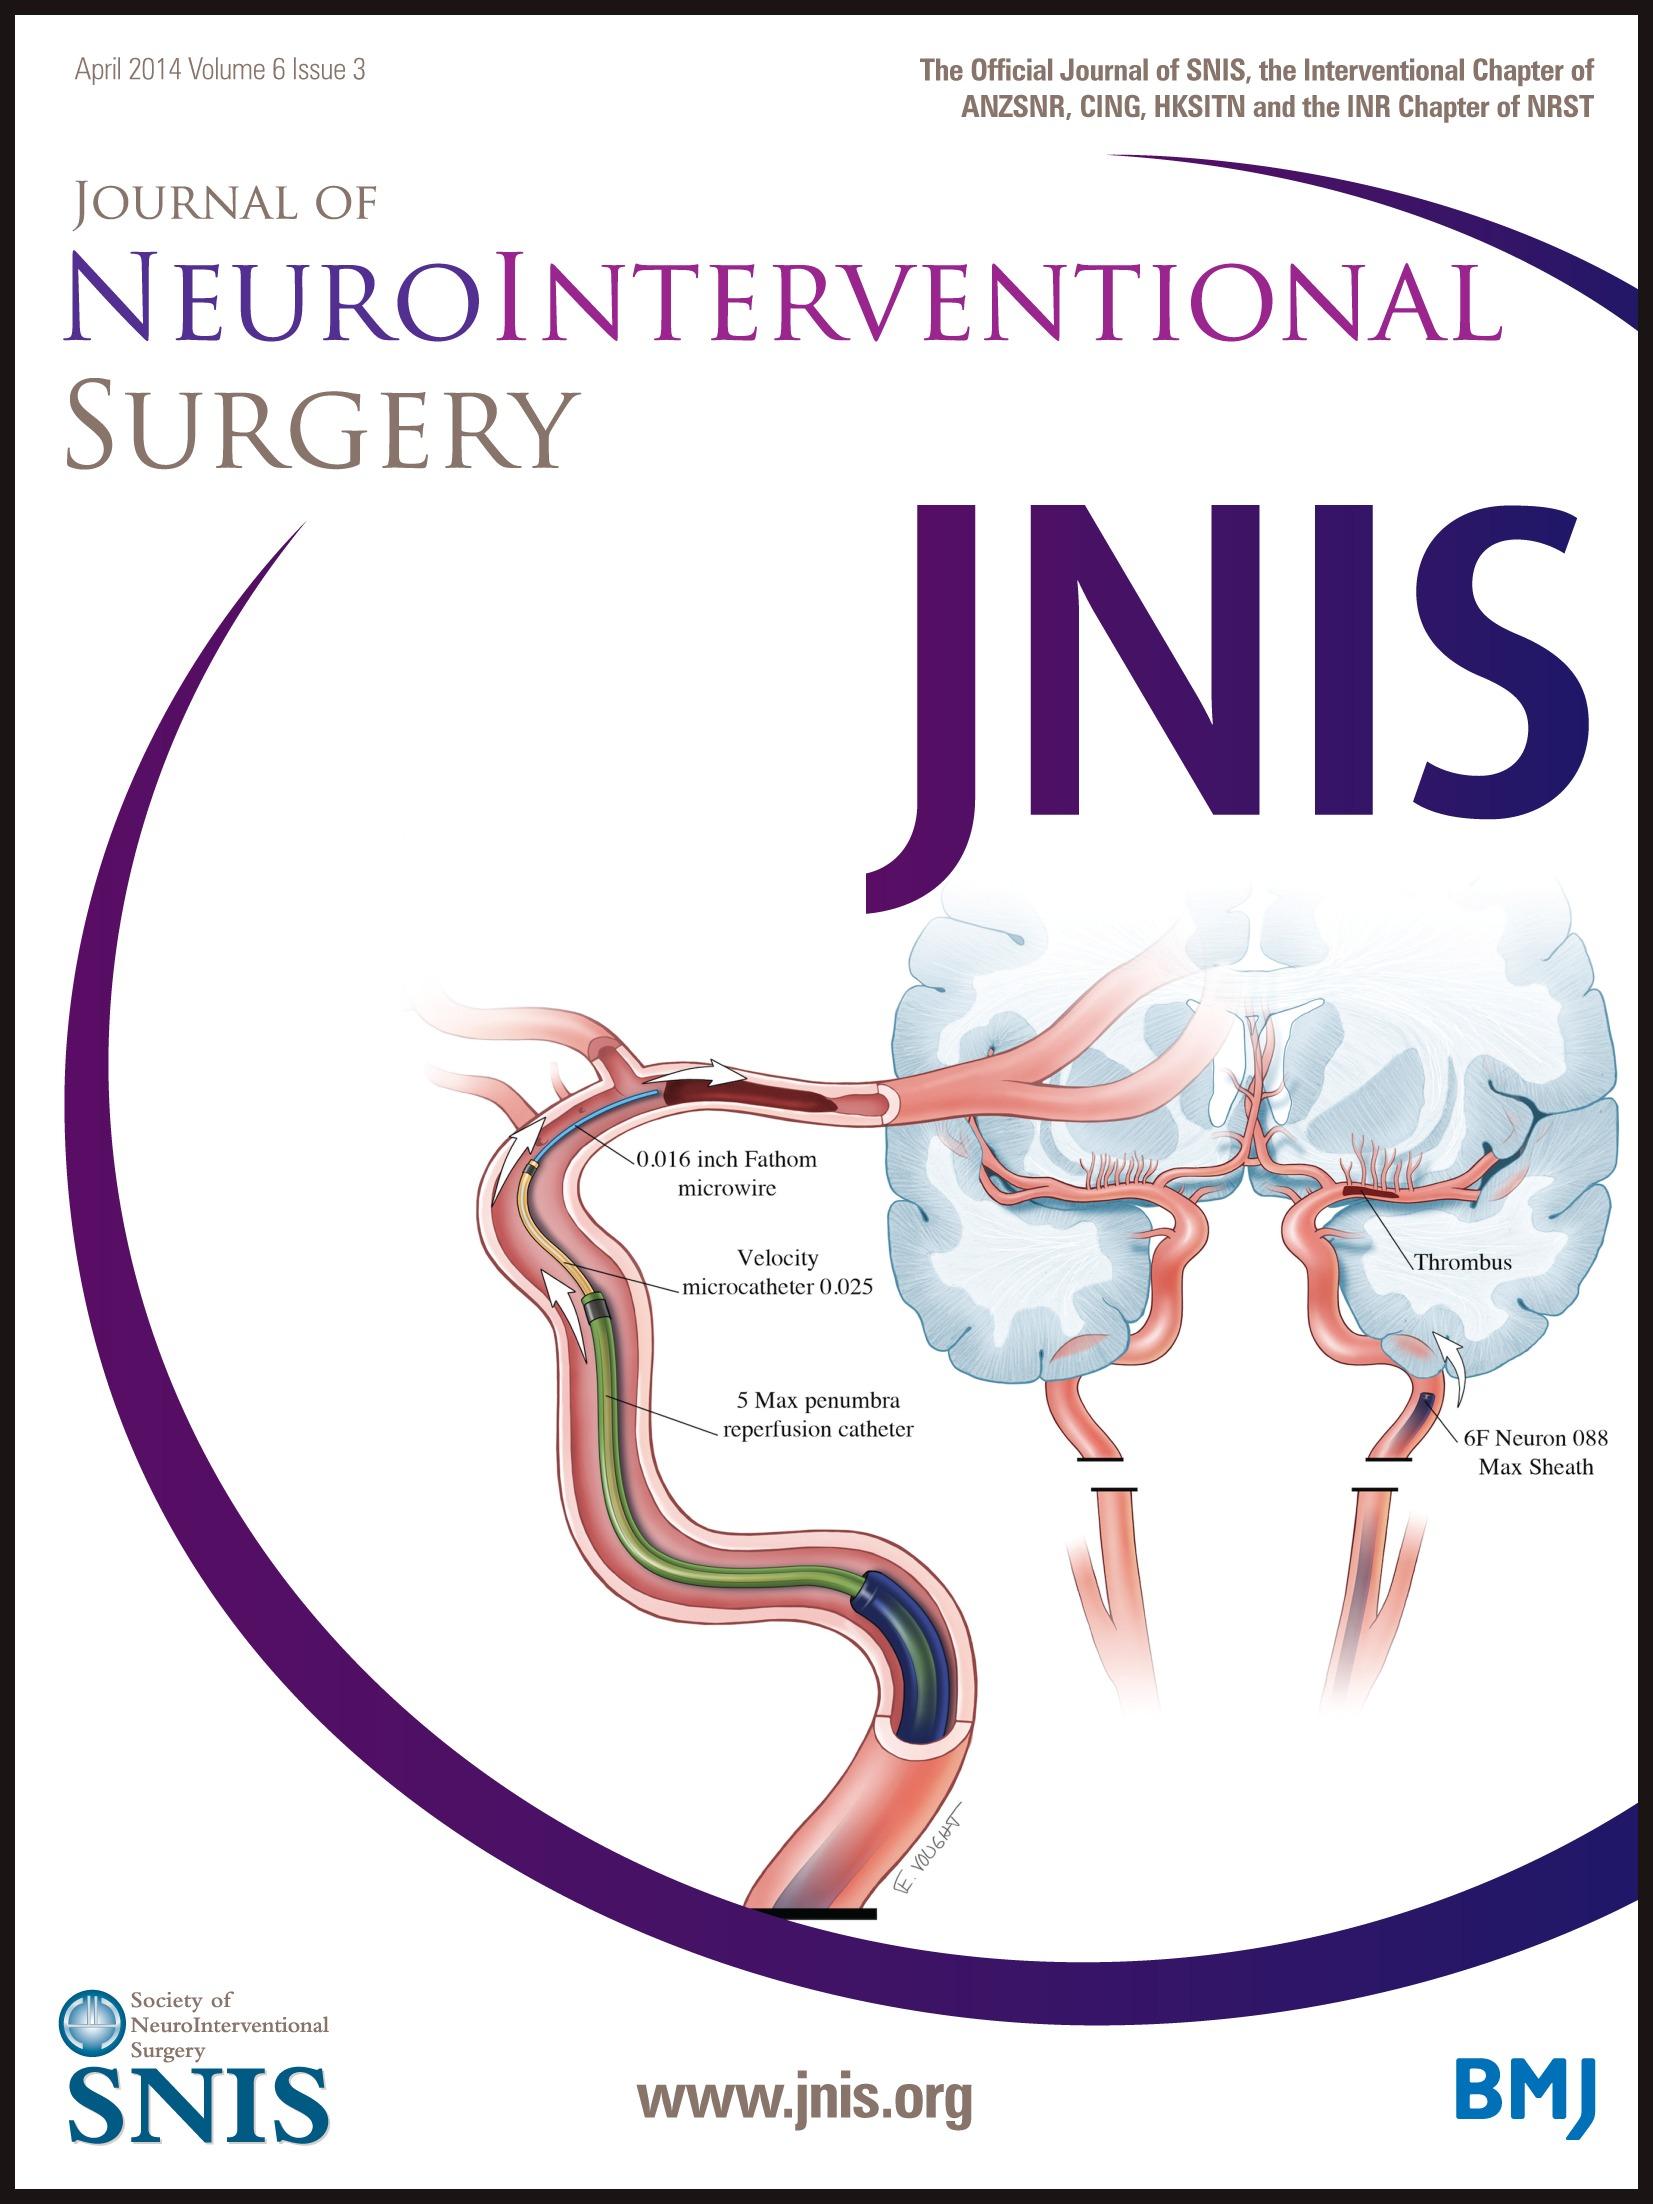 Ultrasound guided V3 segment vertebral artery direct percutaneous ...